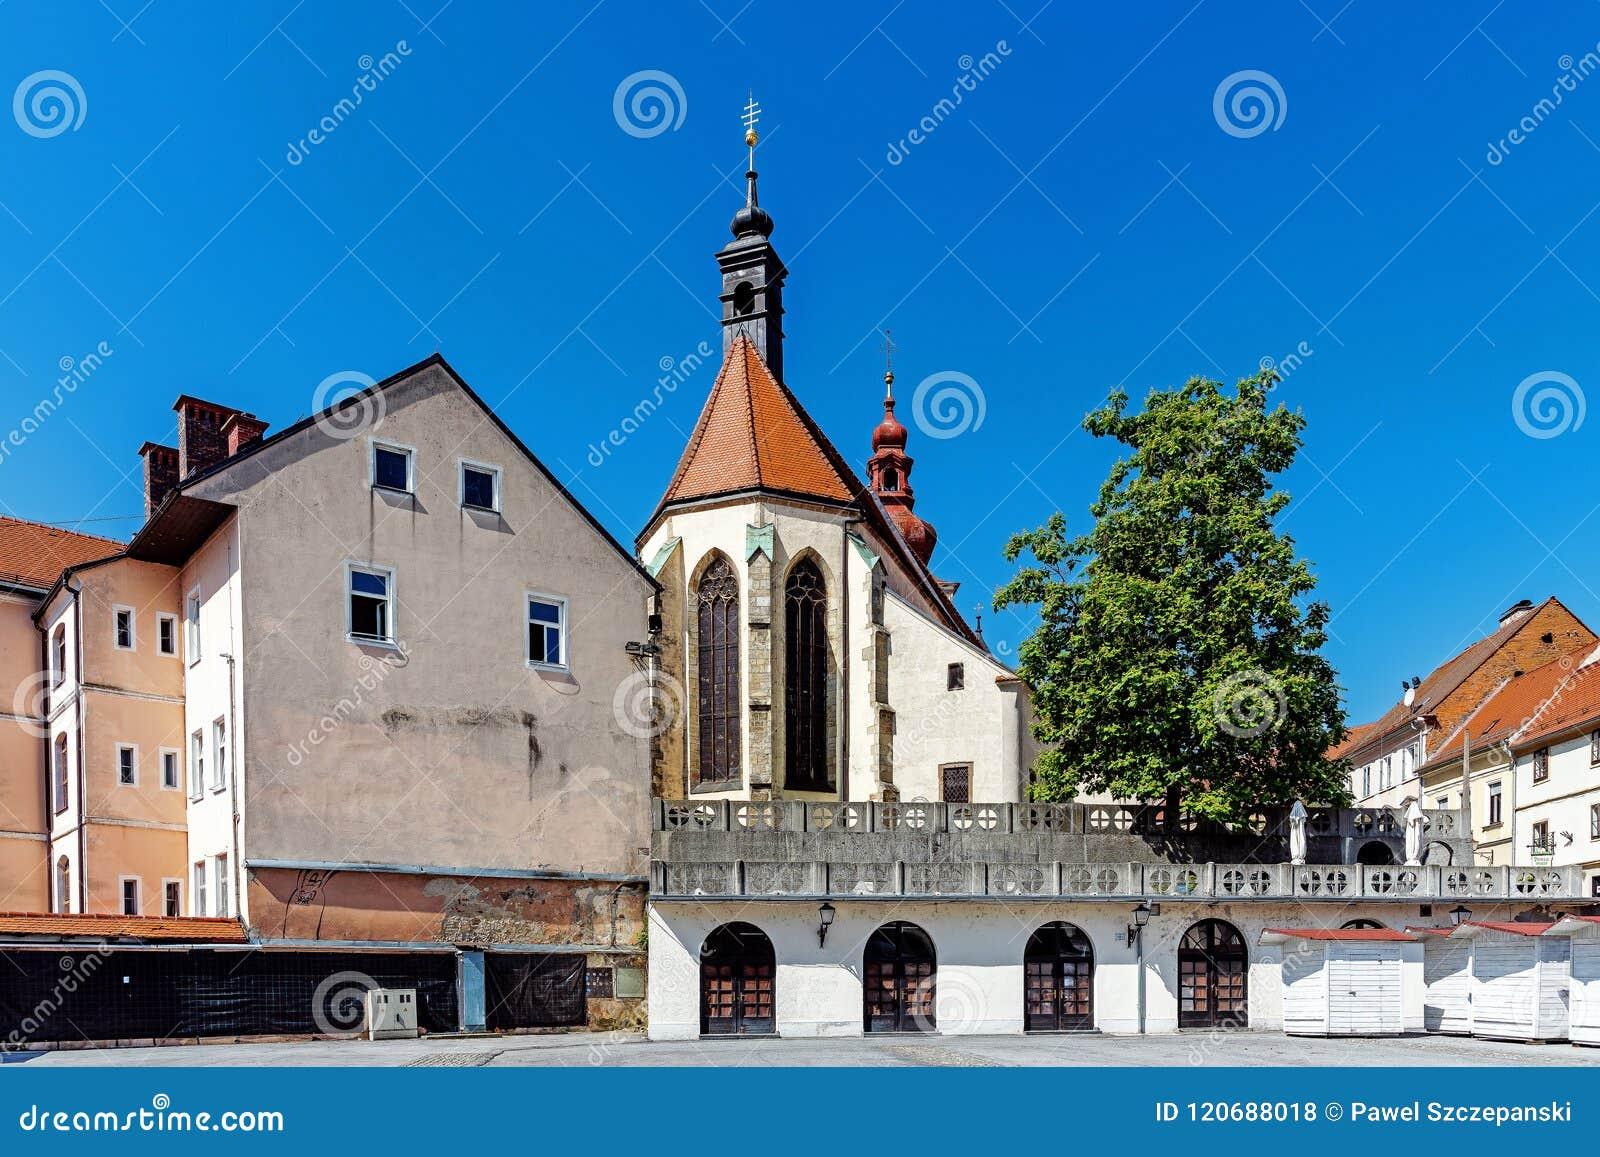 Cityscape of Ptuj